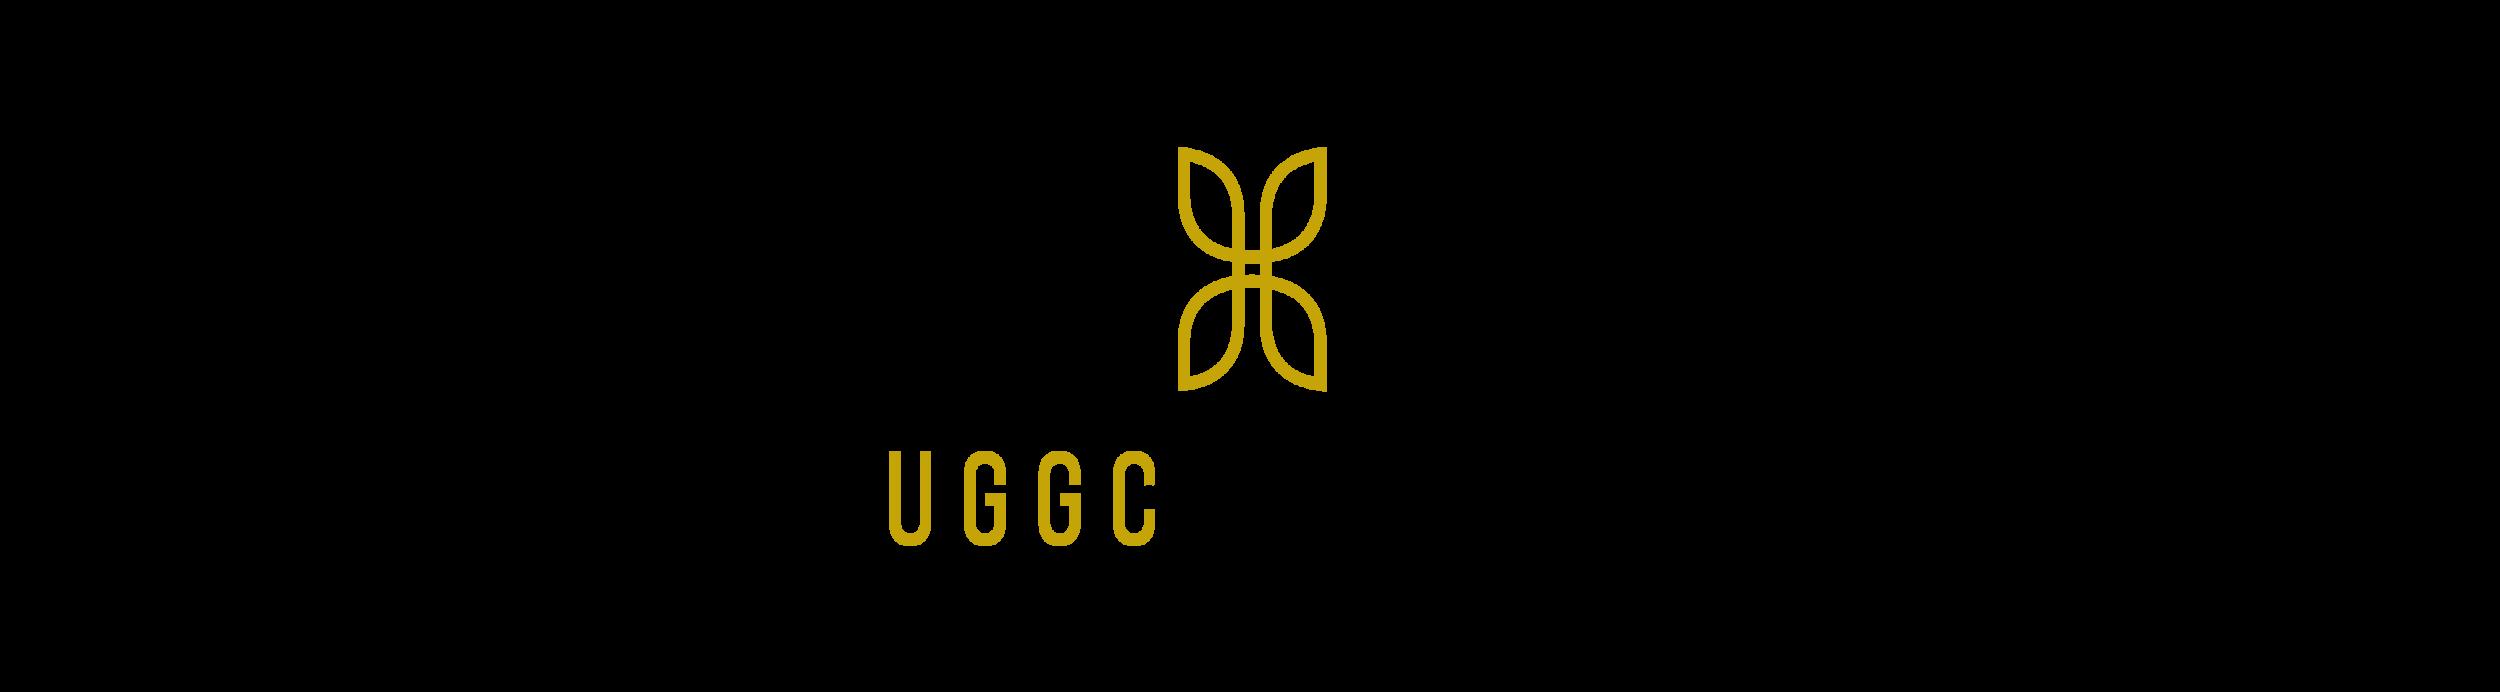 UGGC new bandeau.png